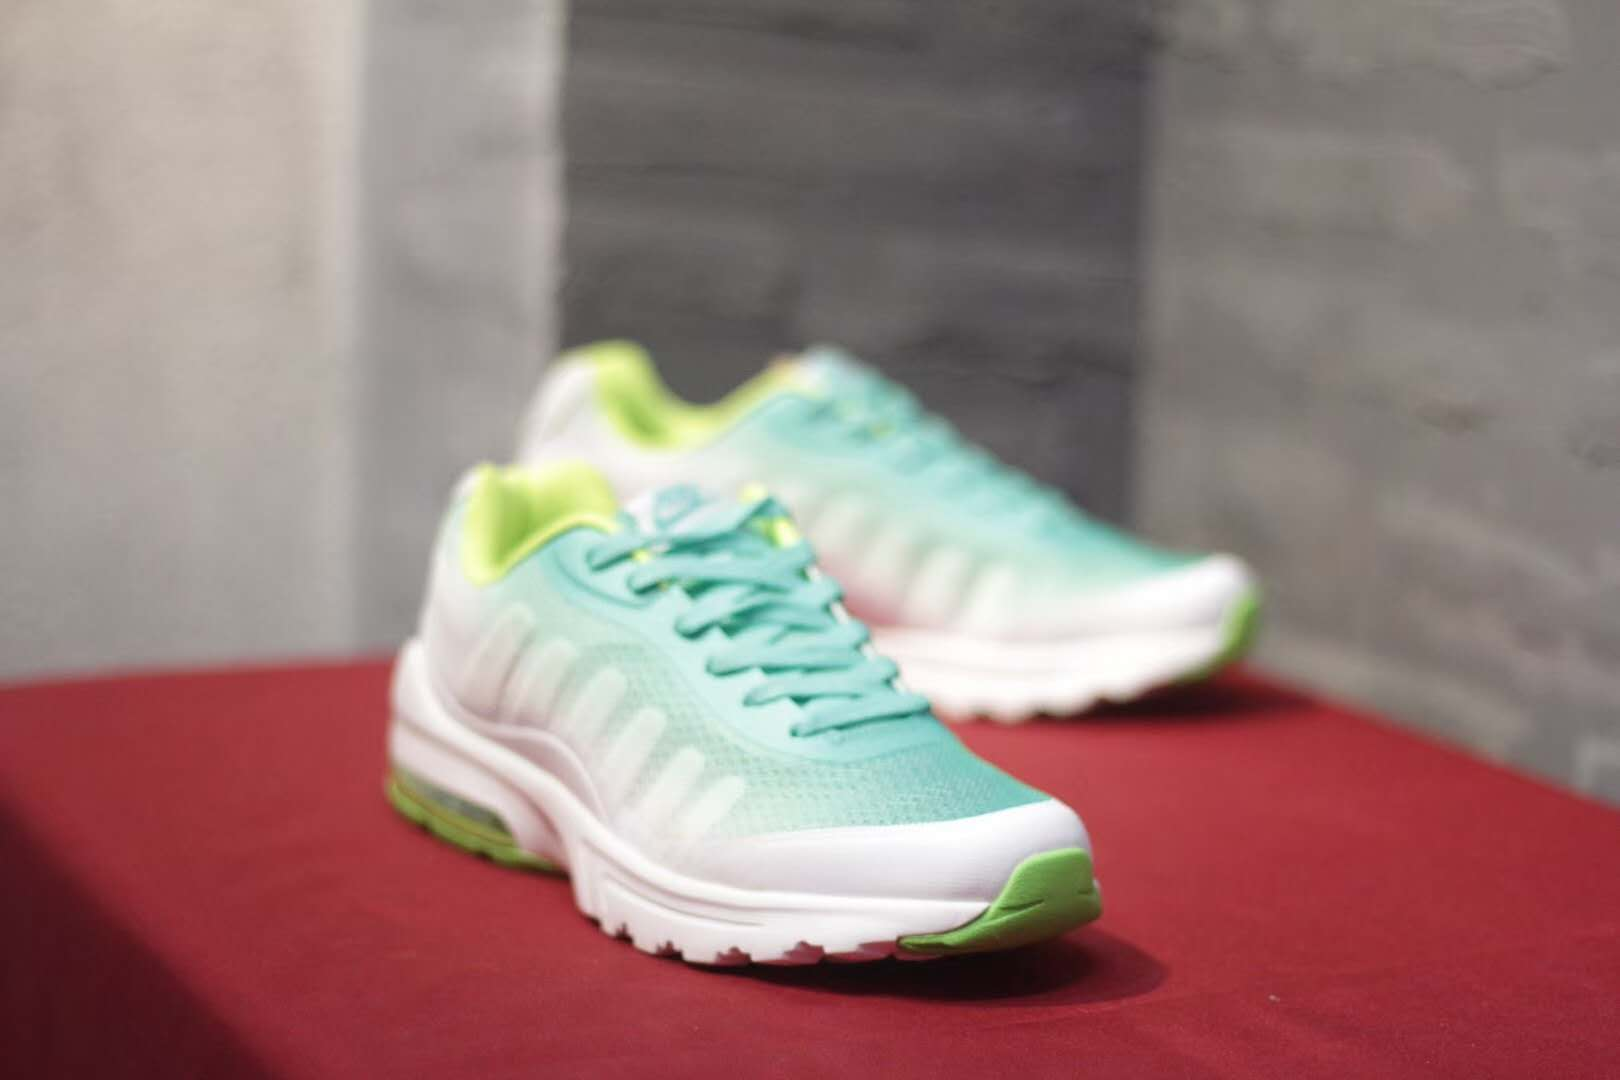 af178049fa ... shopping women nike air max invigor print 95 gint green white shoes  9f150 f35a9 ...